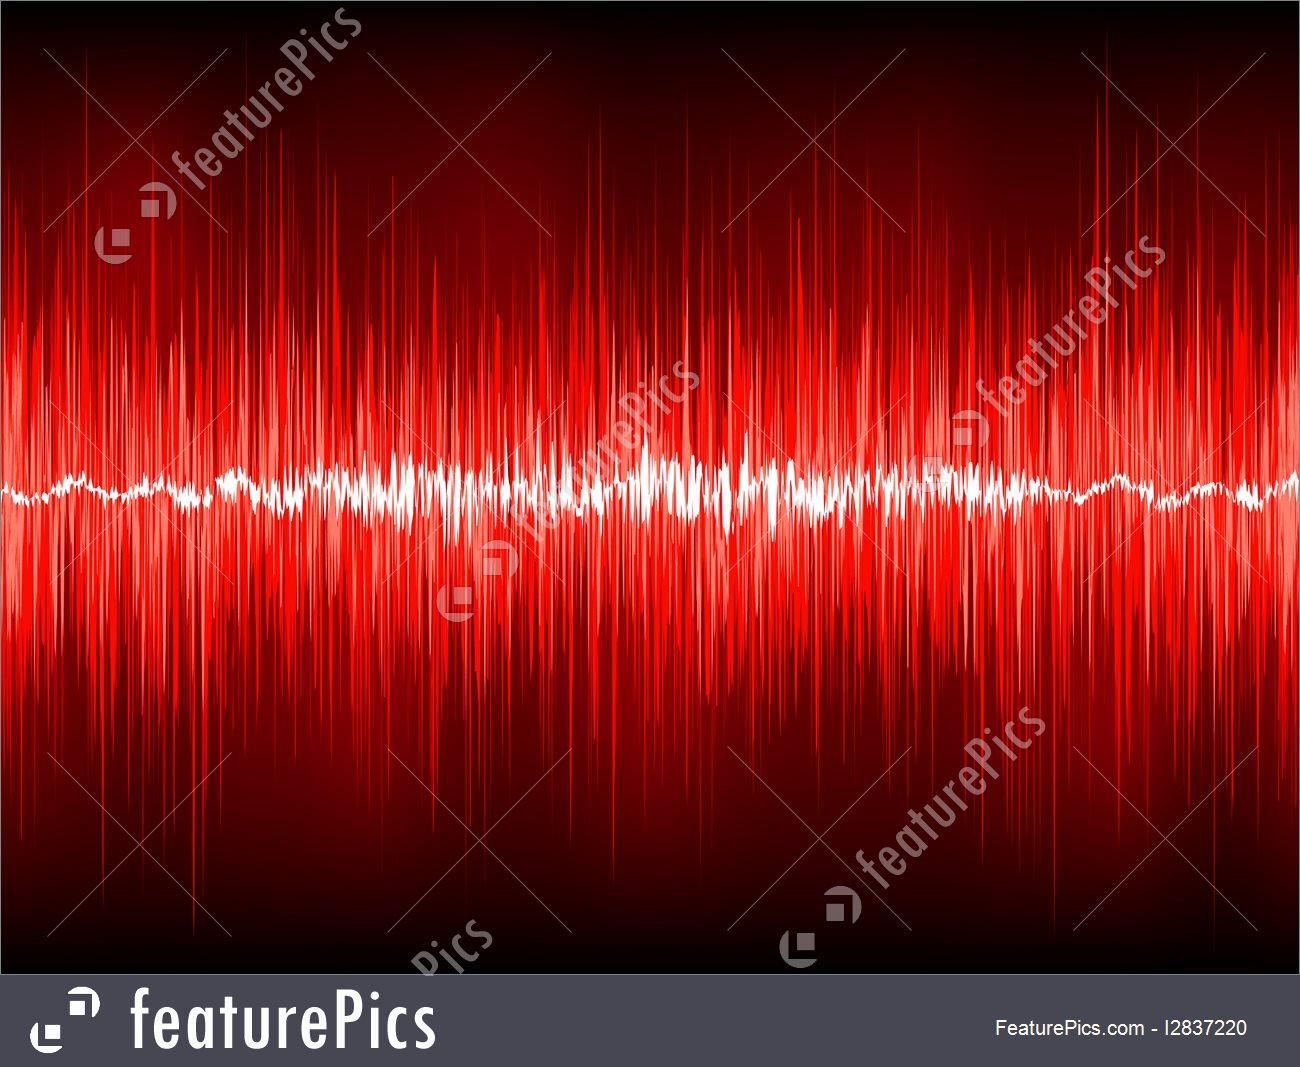 1300x1067 Red Waveform Vector Background. Eps 8